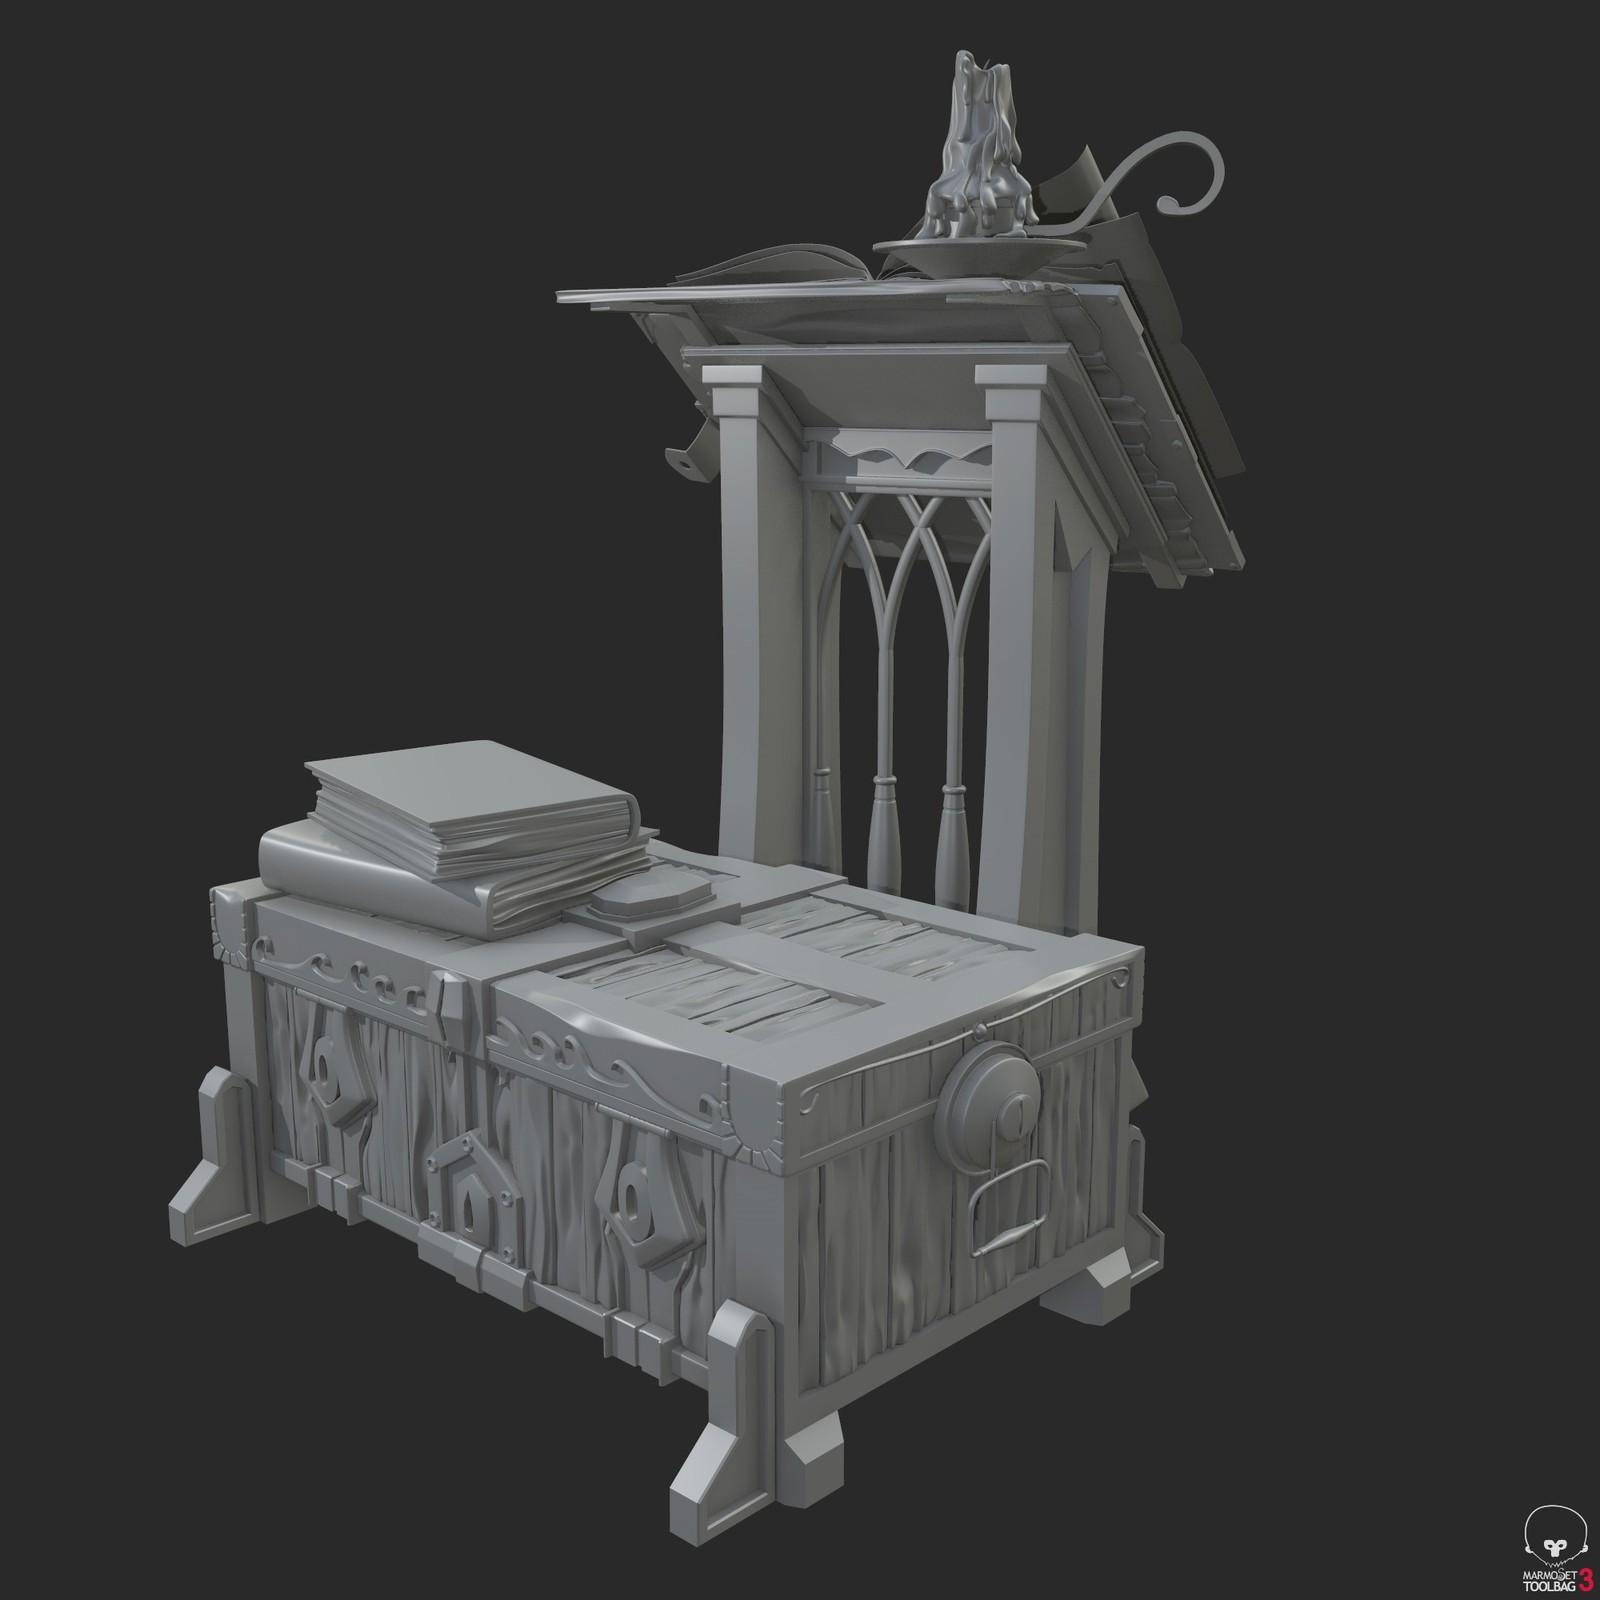 Treasure Chest and Podium